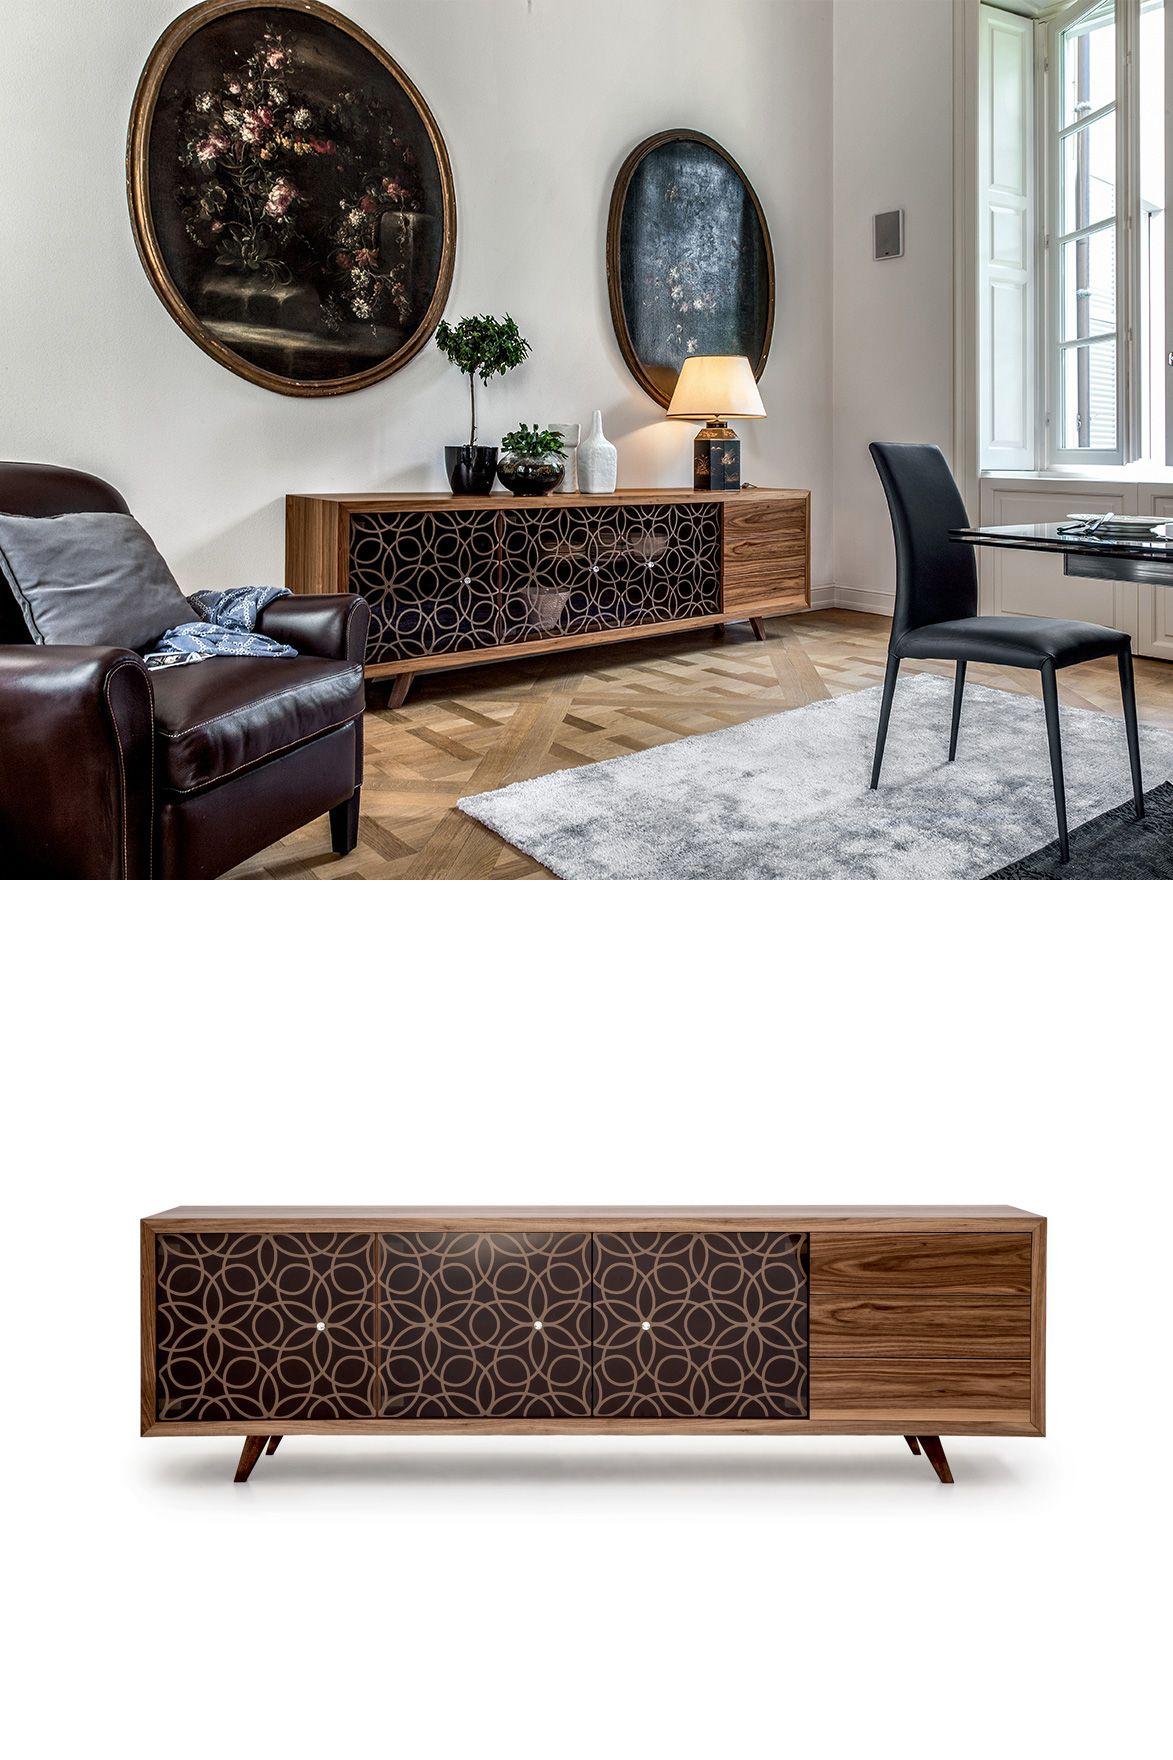 sideboard granada von tonin casa italy design sideboards. Black Bedroom Furniture Sets. Home Design Ideas